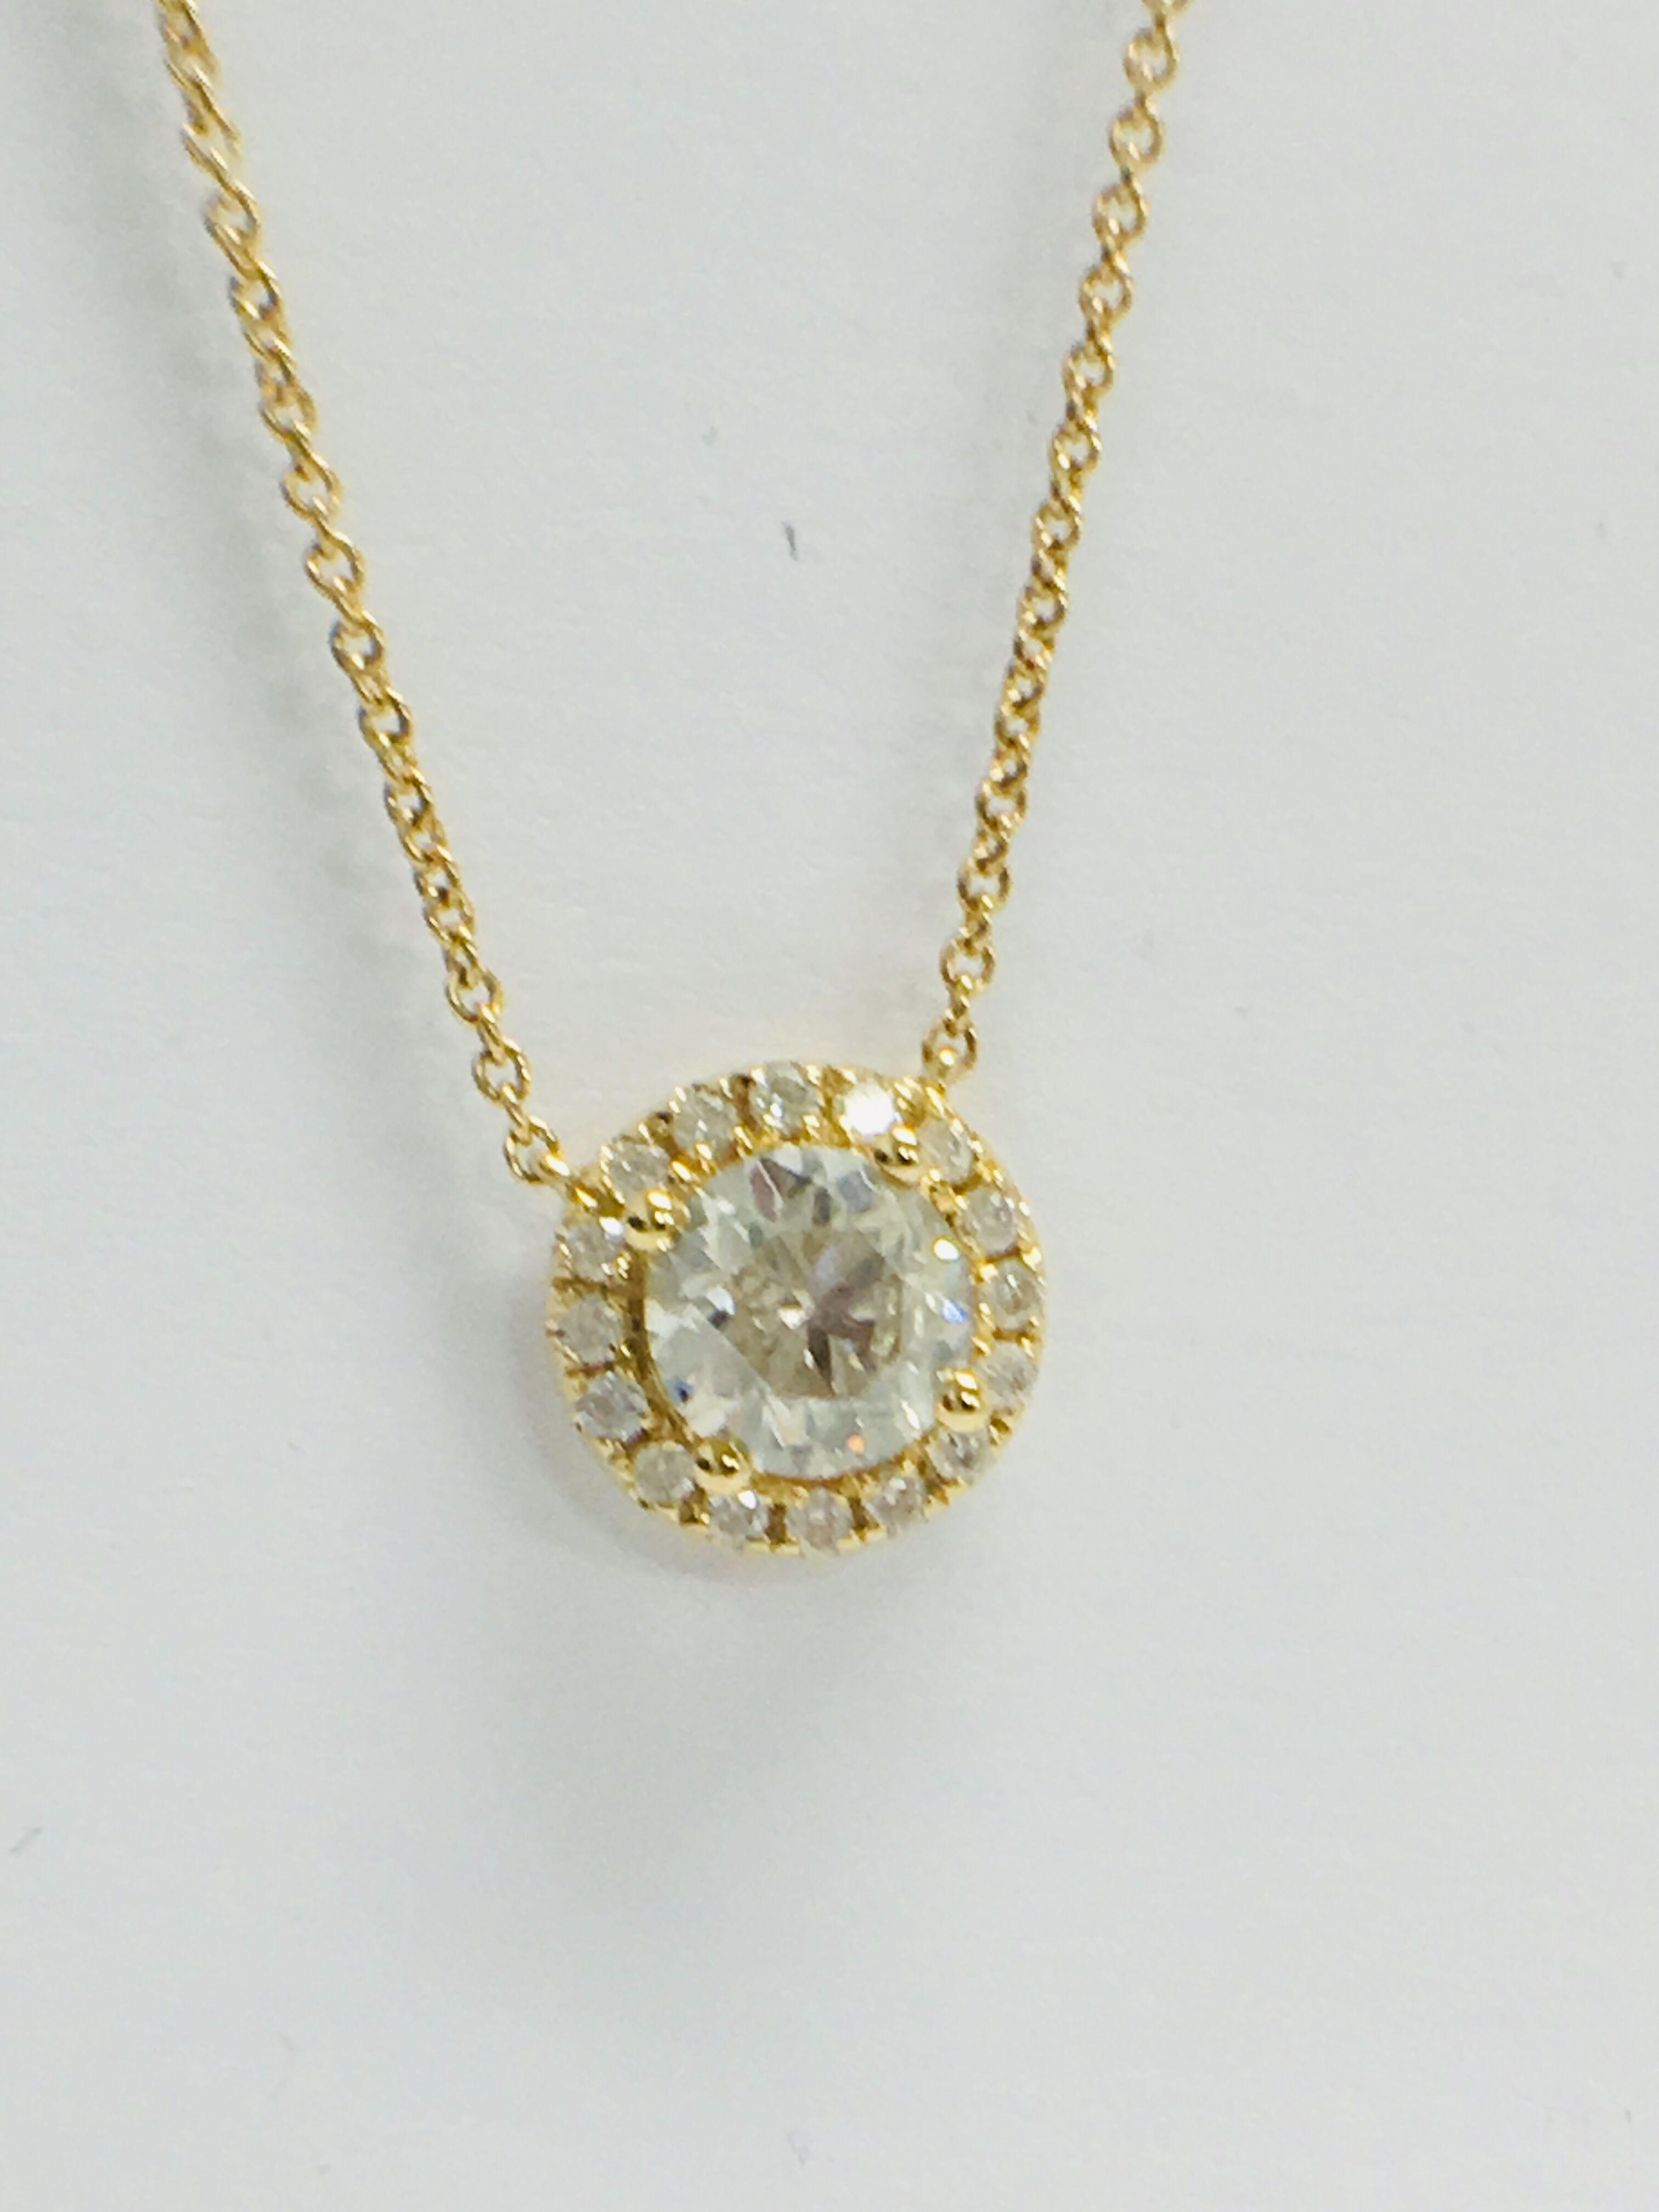 Lot 18 - 18ct Yellow Gold Diamond Necklace tdw